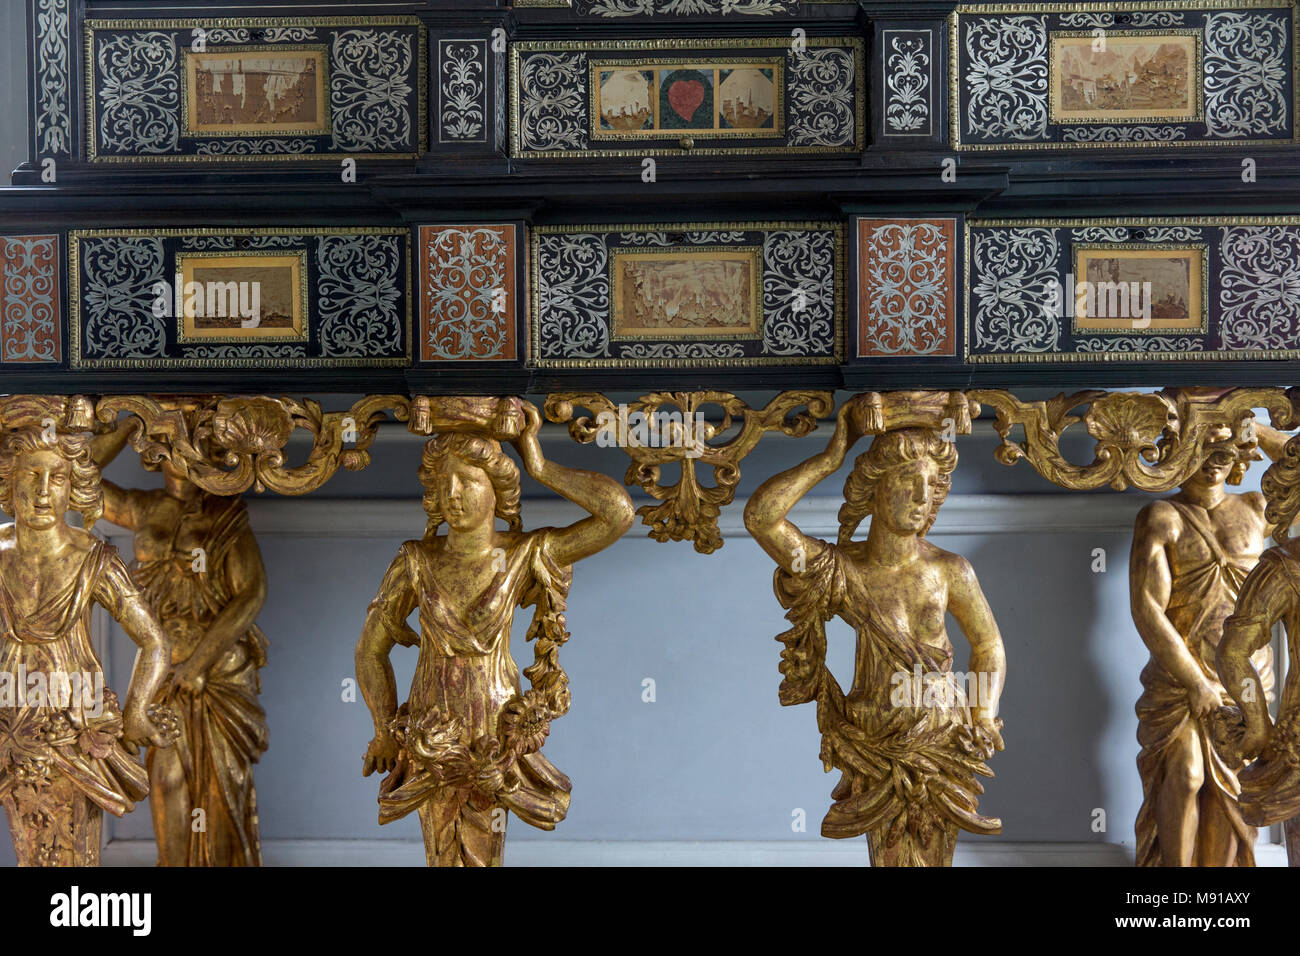 Vaux-le-vicomte castle. King's closet. Inlaid ebony and marquetry cabinet (detail). Caryatids symbolizing the 4 seasons. France. - Stock Image